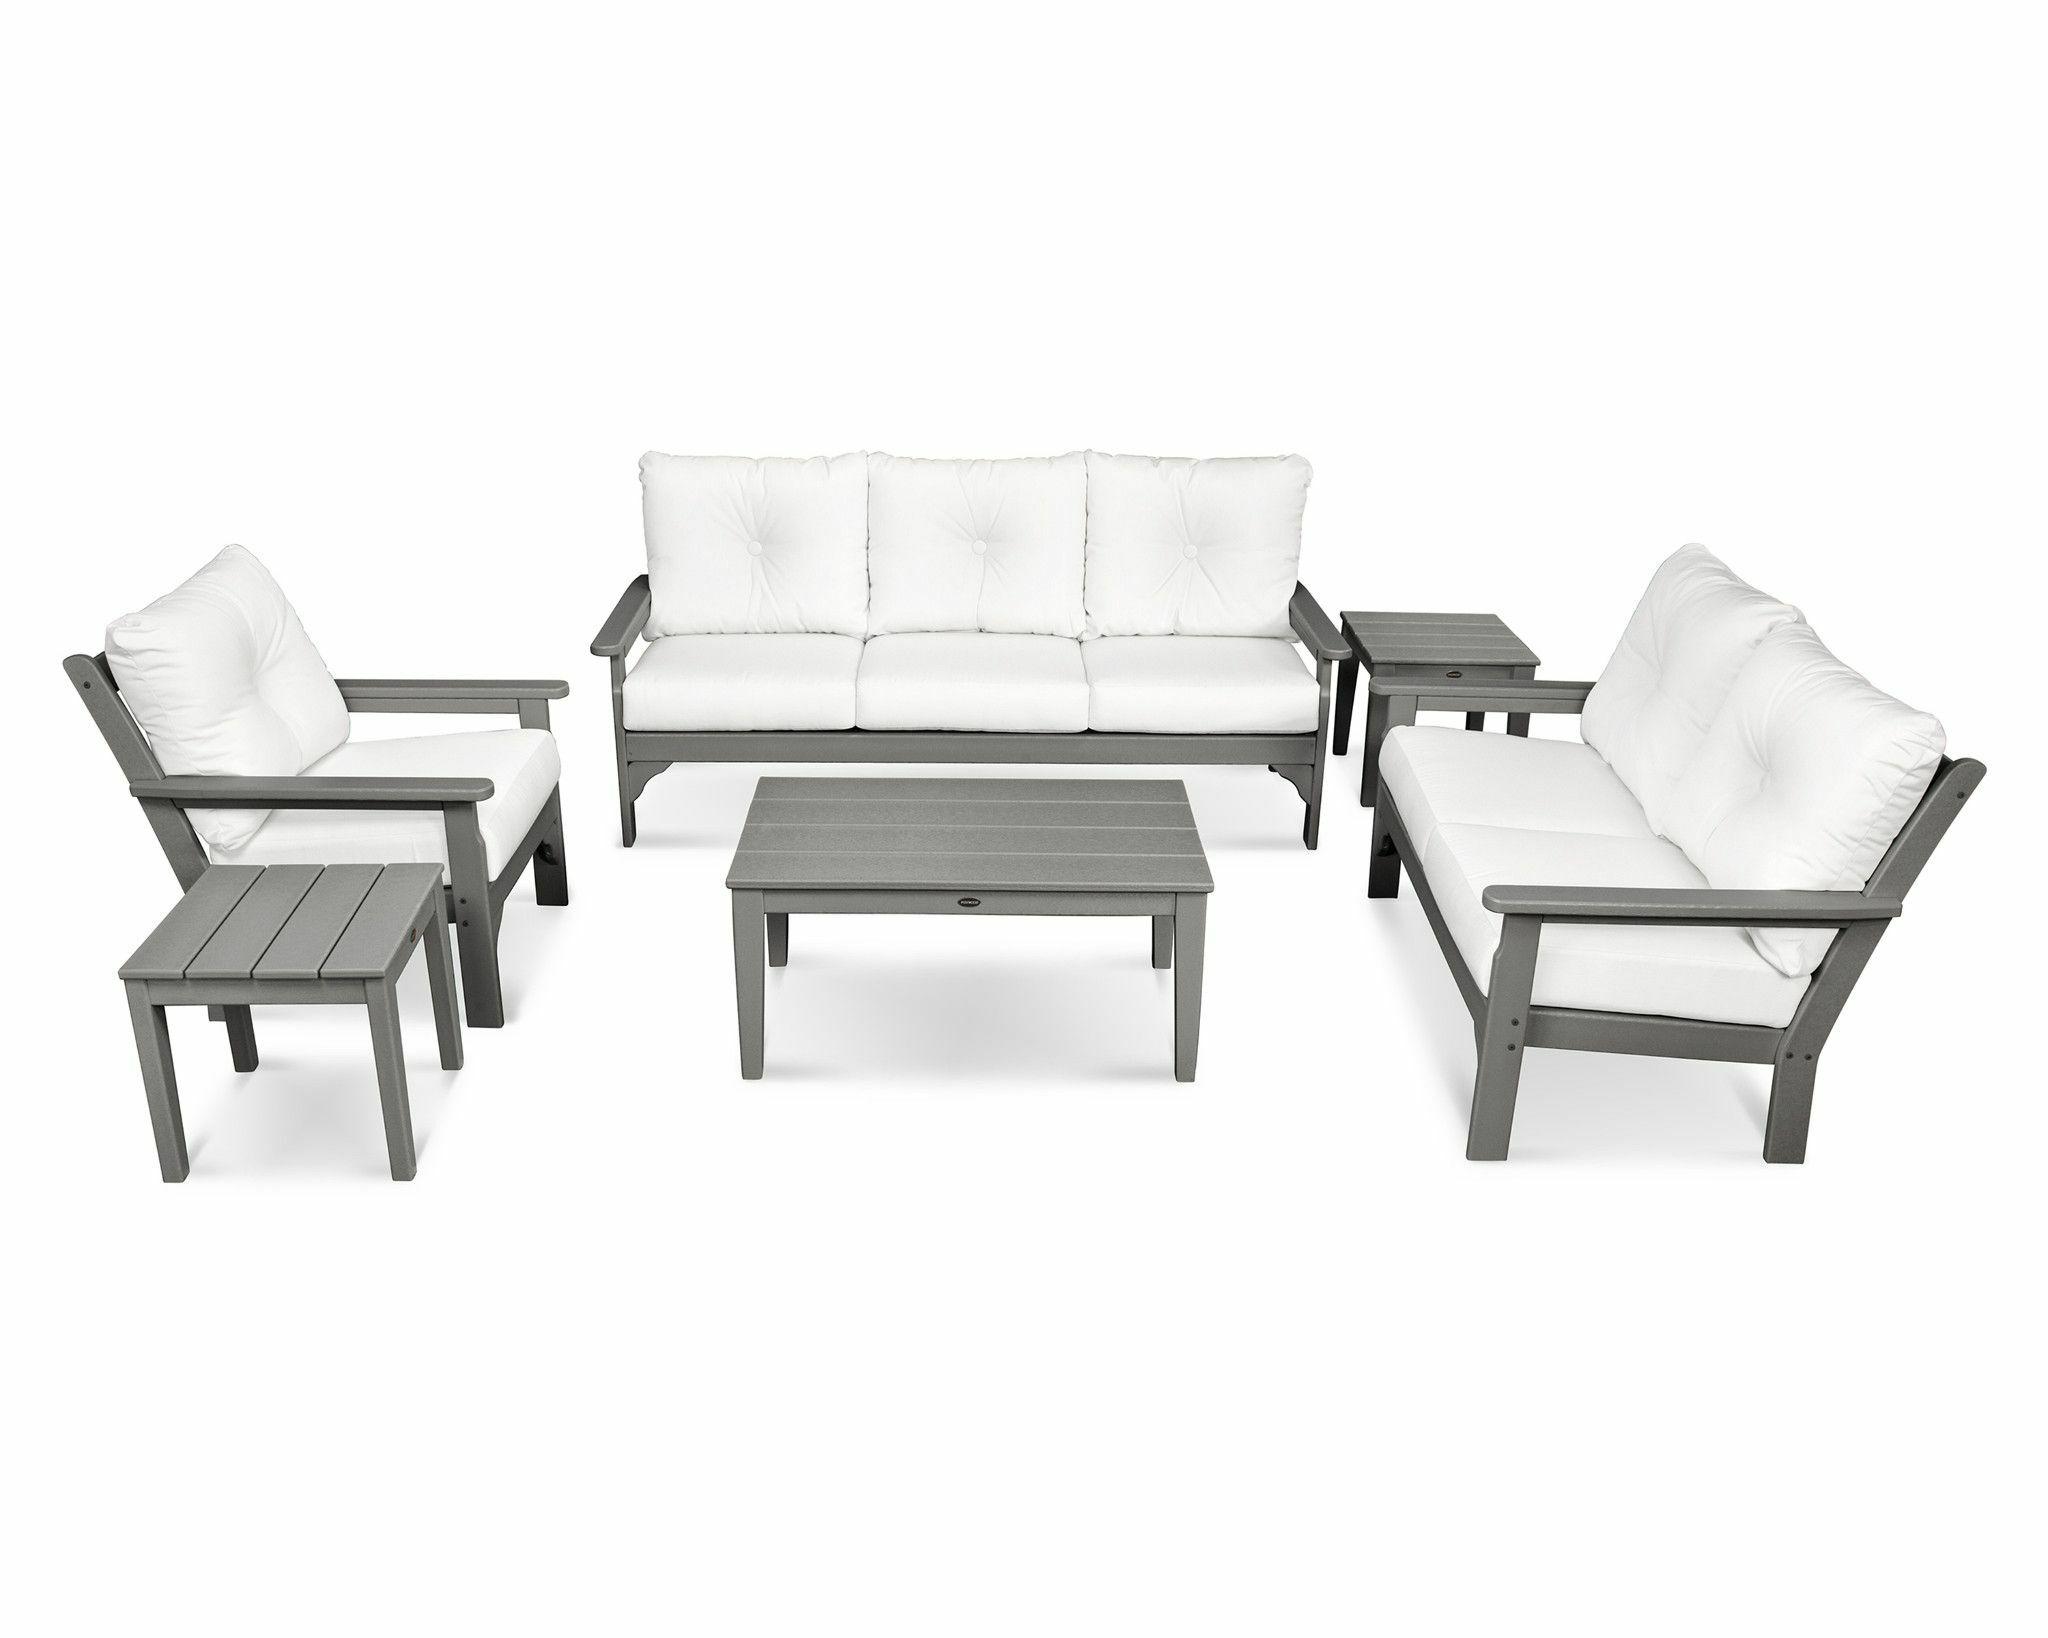 Vineyard 6 Piece Sunbrella Sofa Set with Cushion Frame Color: Slate Gray, Fabric: Natural